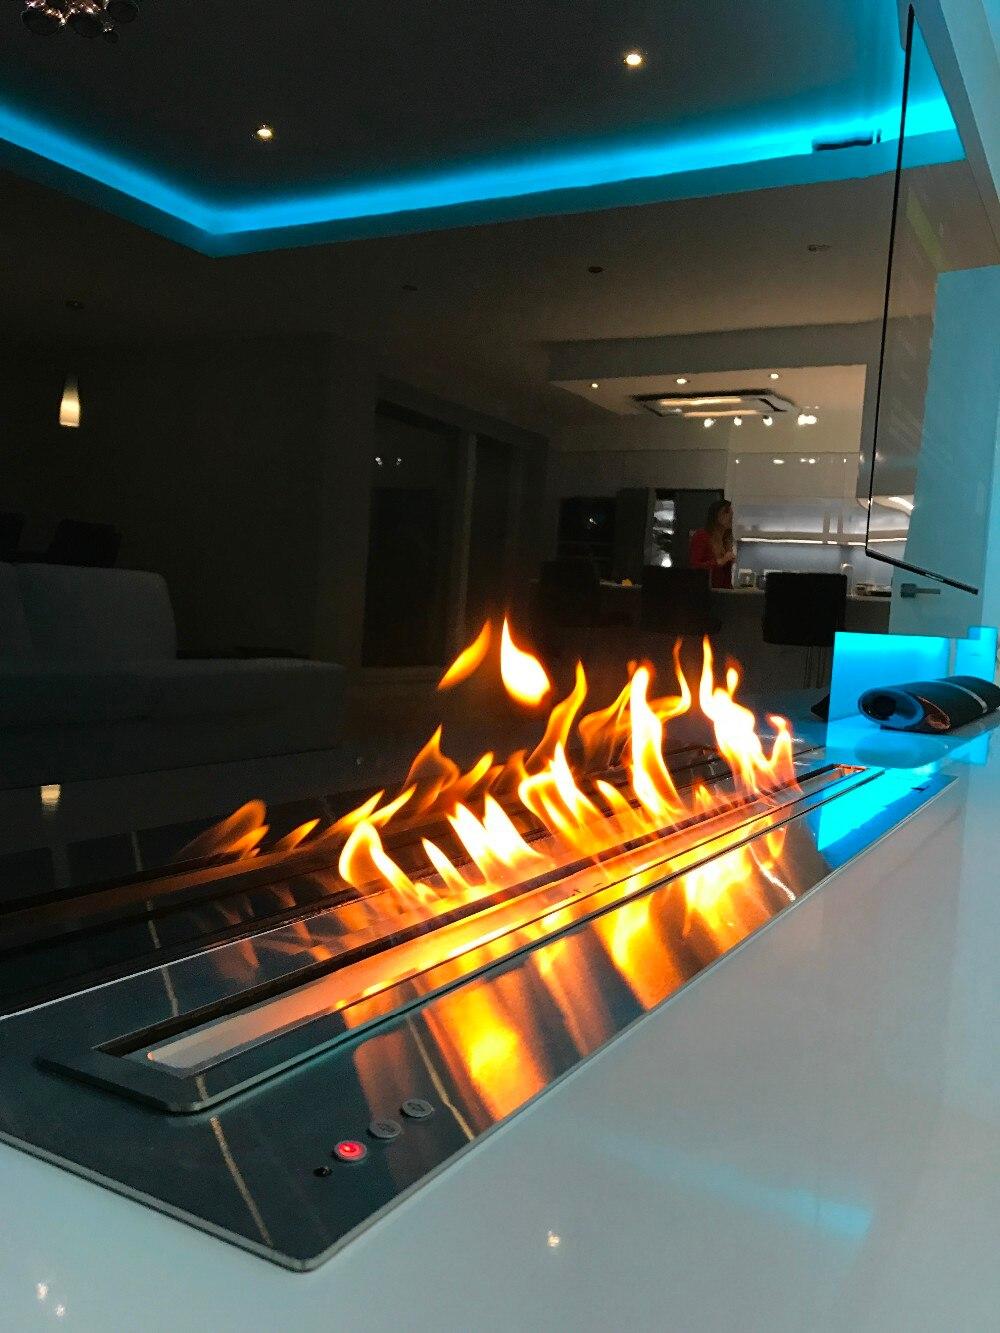 Hot Sale 72 Inches Biofuel Smart Burner Insert Ethanol Chimney Remote Control